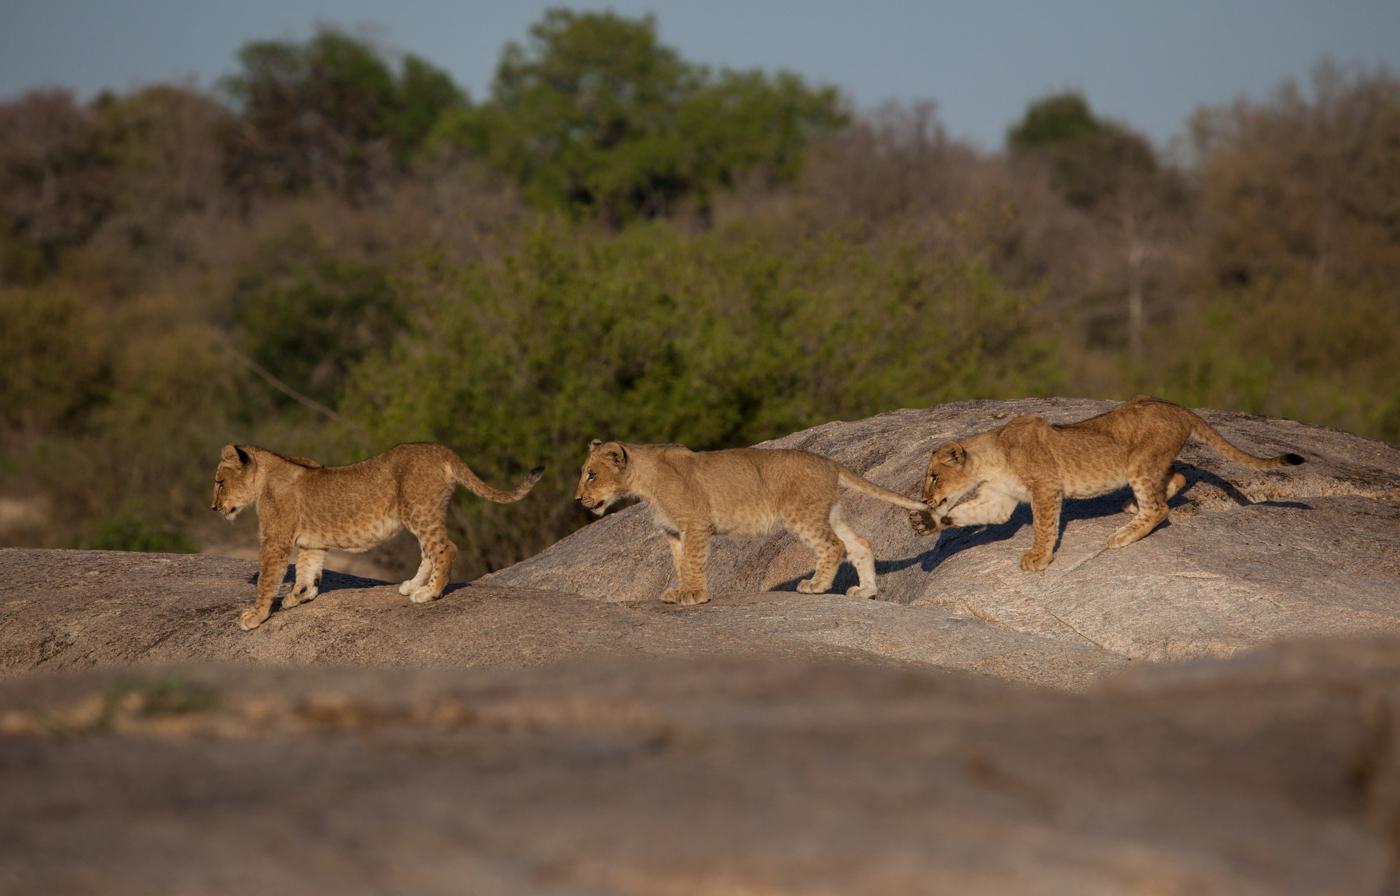 tsalala cub trio, tail pulling